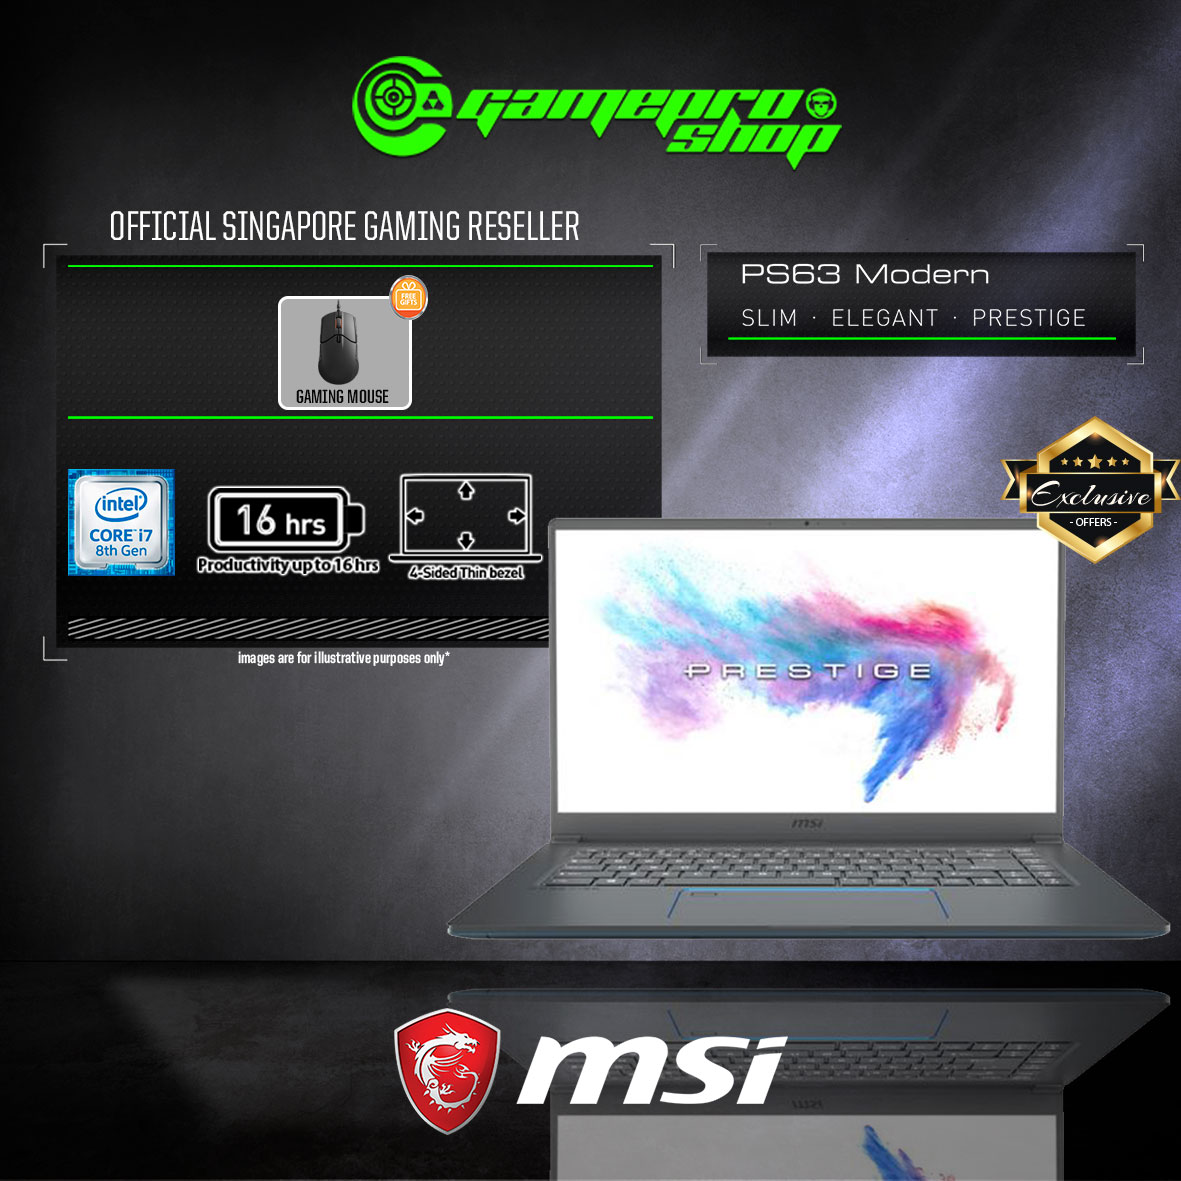 MSI PS63 8SC - 053SG EXCLUSIVE 512GB SSD (GTX 1650 4GB GDDR5)